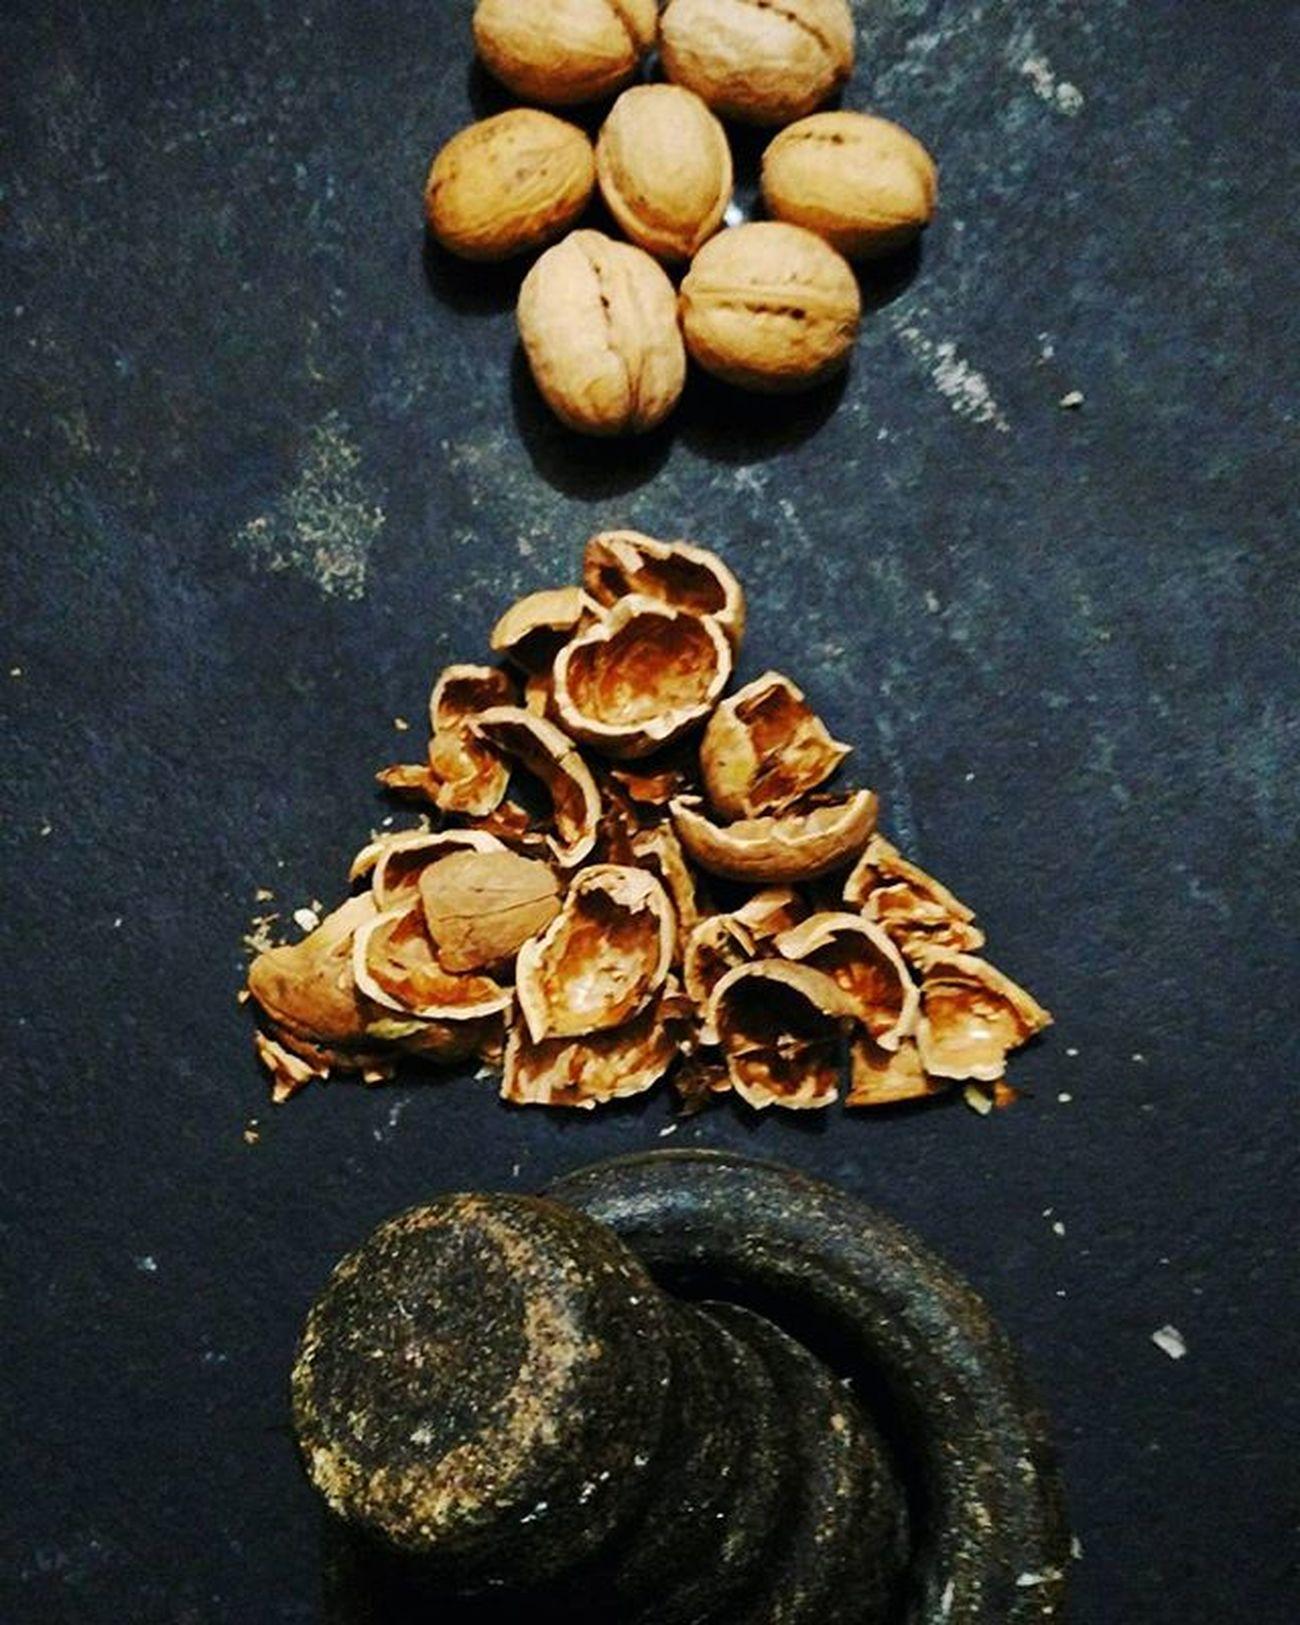 :: Stone Age :: Walnut Kashmir Stoneage Stone Nut Dryfruit Ammi Malayali Malayalam Mallugram Instagramers Black Oldschool Technique India SundayFunday Instapic Instagram Insta Sunday